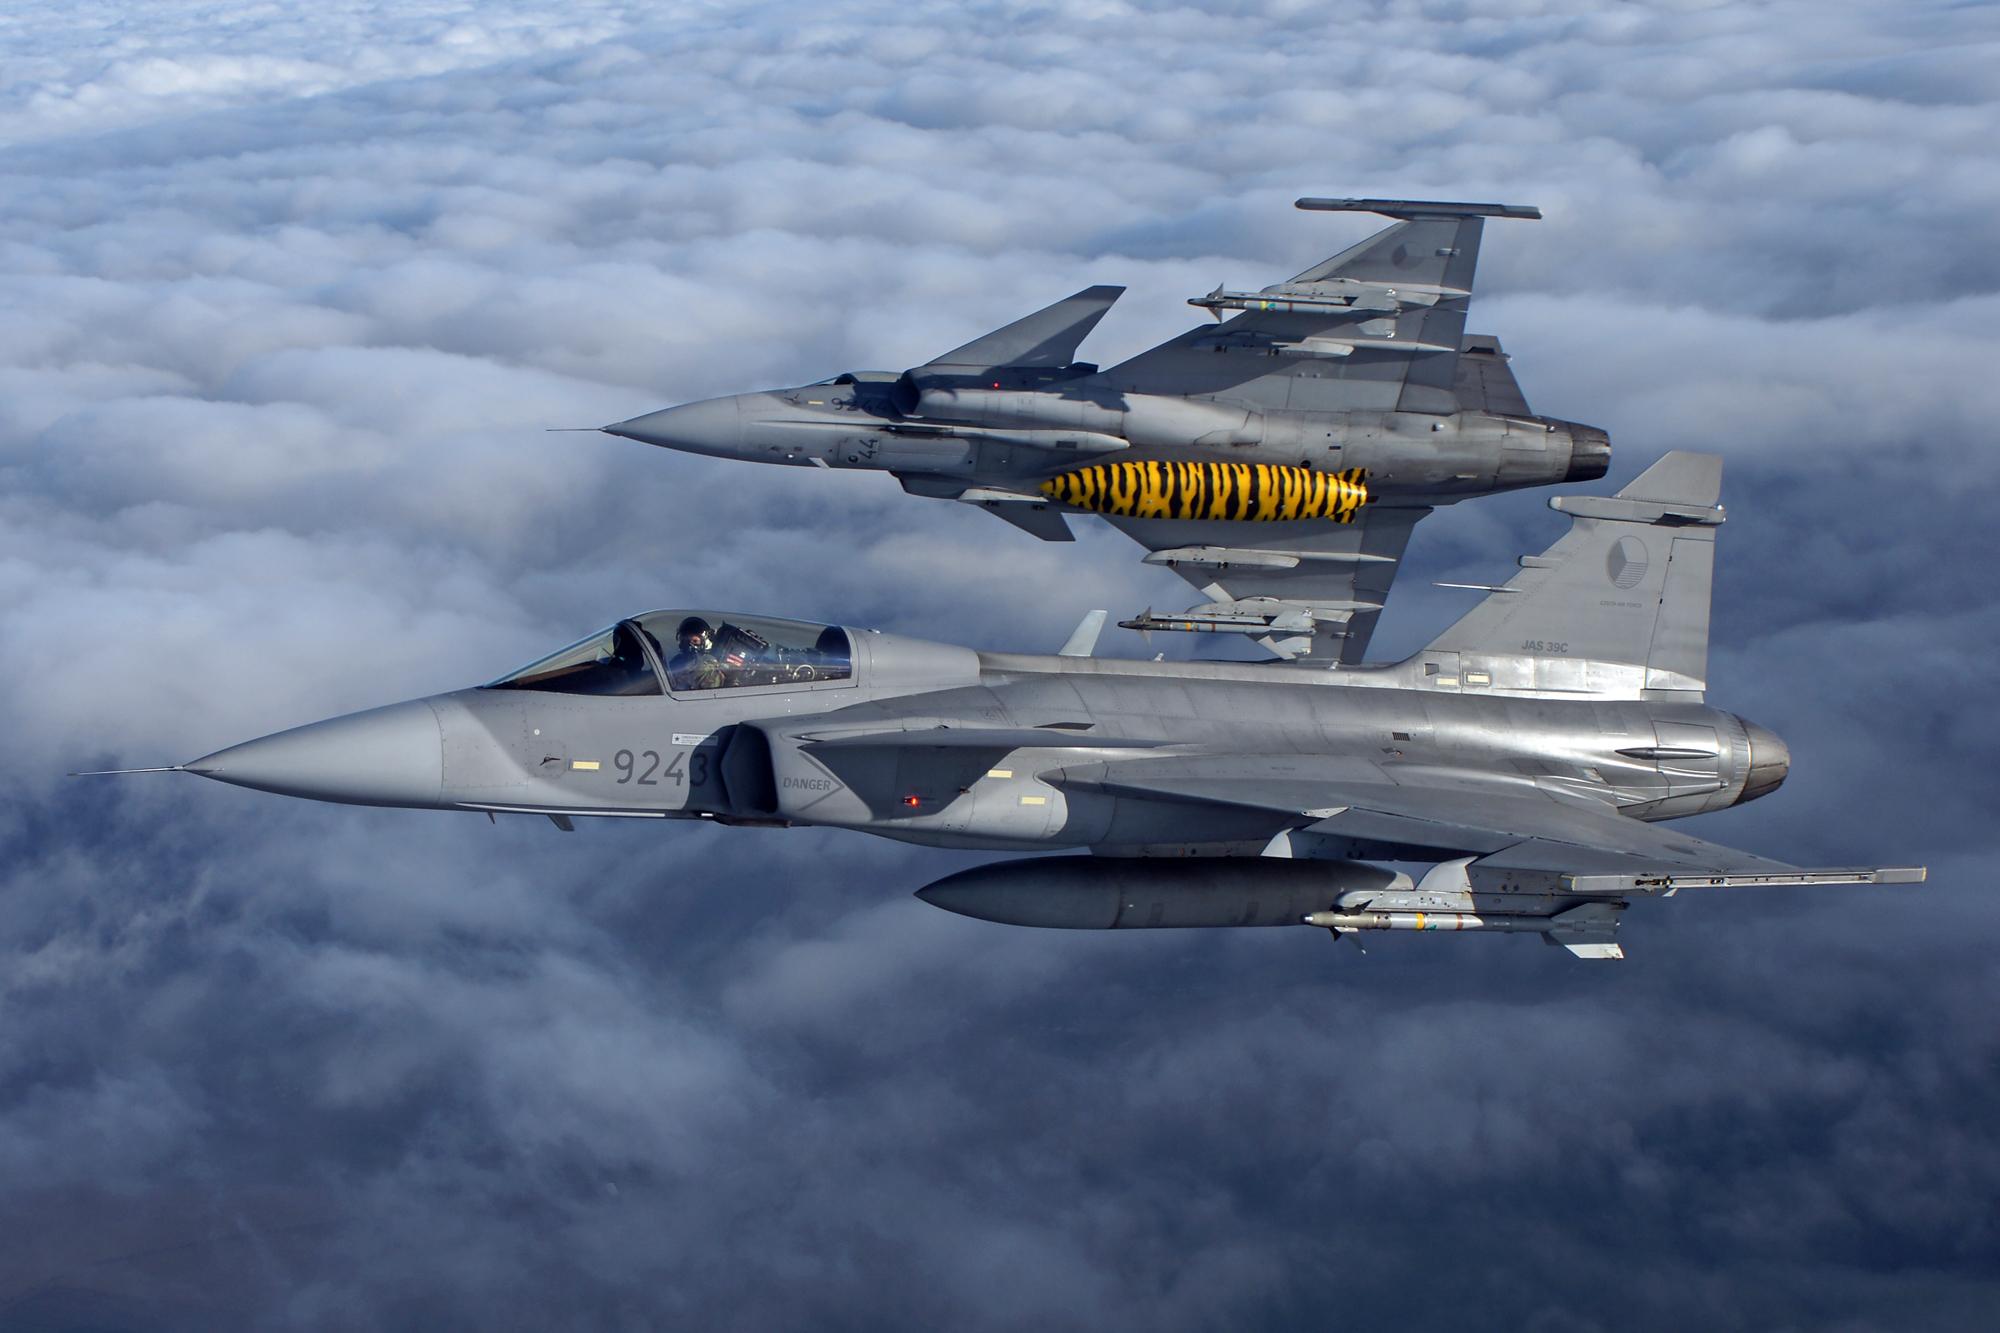 File:Saab JAS-39 Gripen (Czech Air Force) (6417853785).jpg - Wikimedia Commons